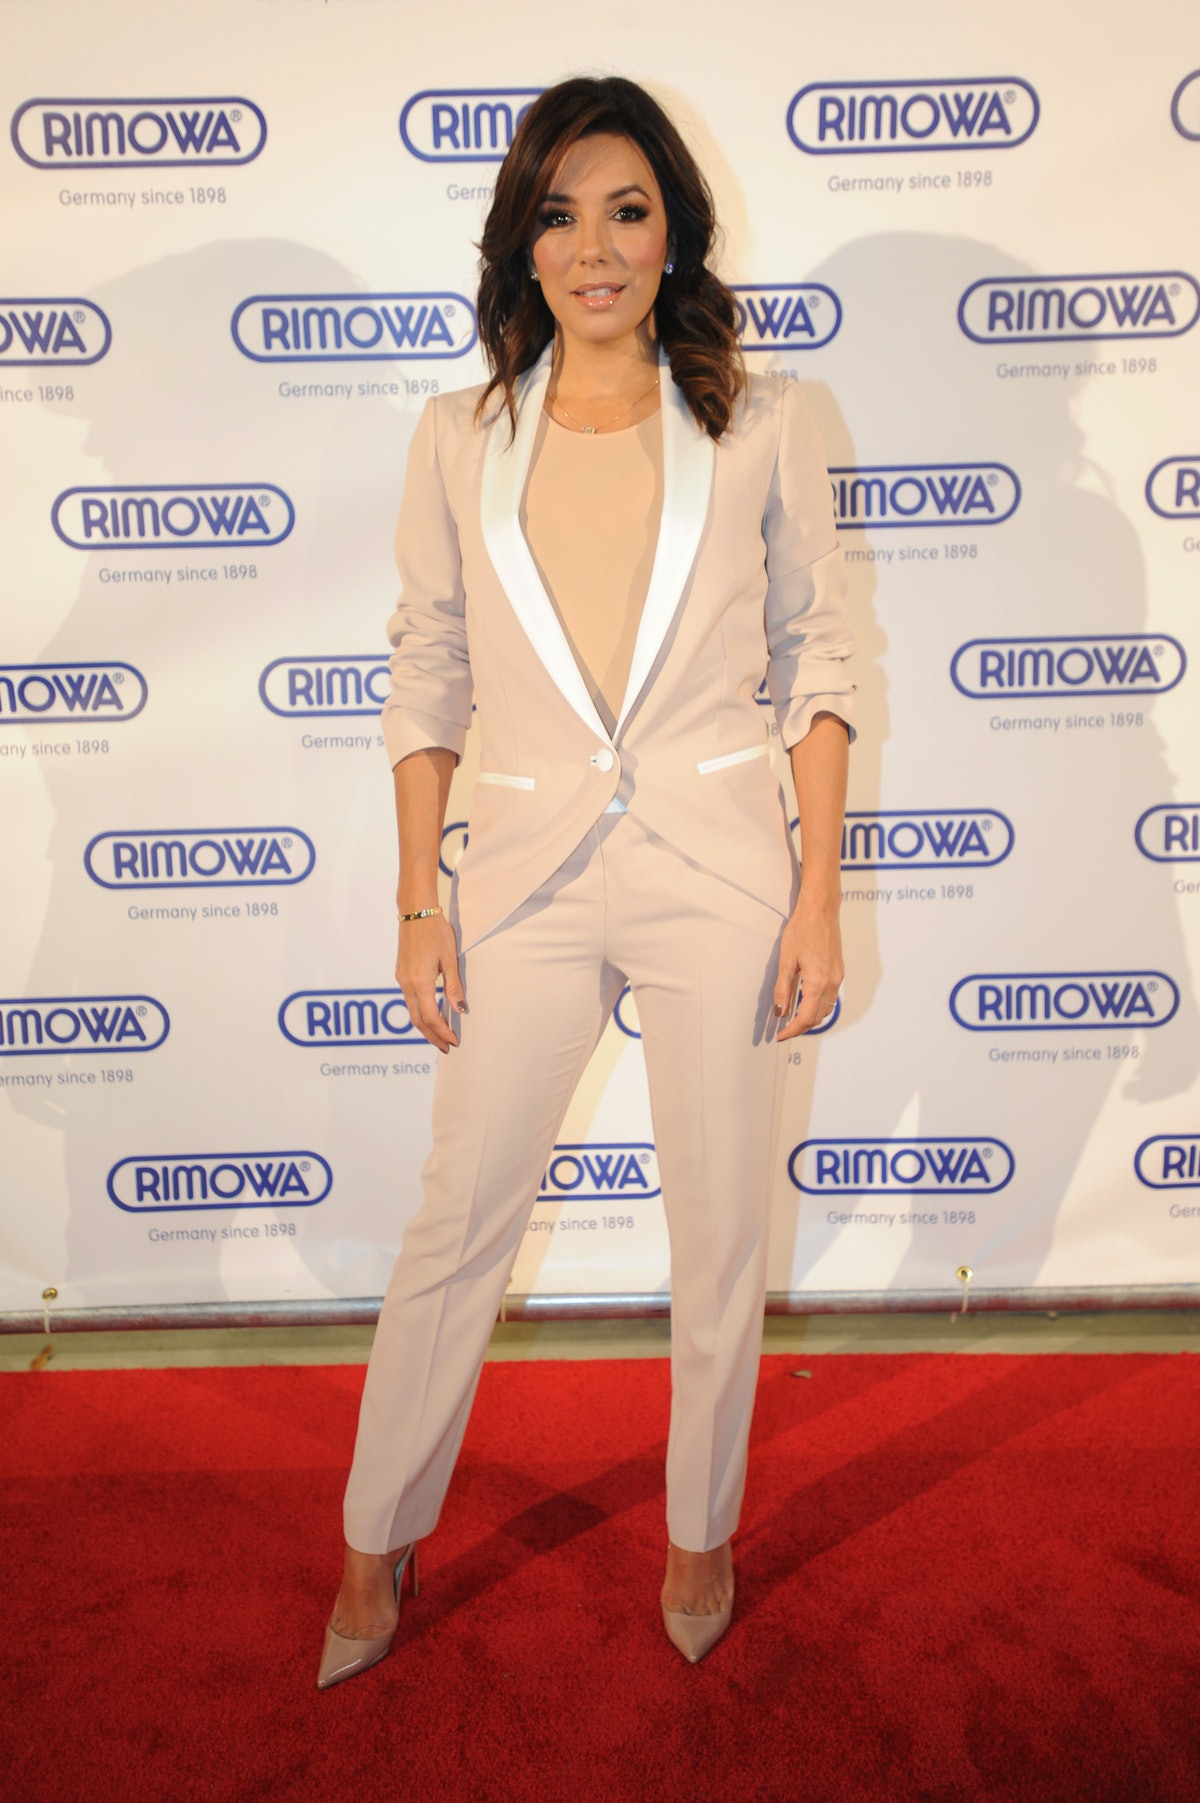 Eva Longoria attends the Rimowa store opening